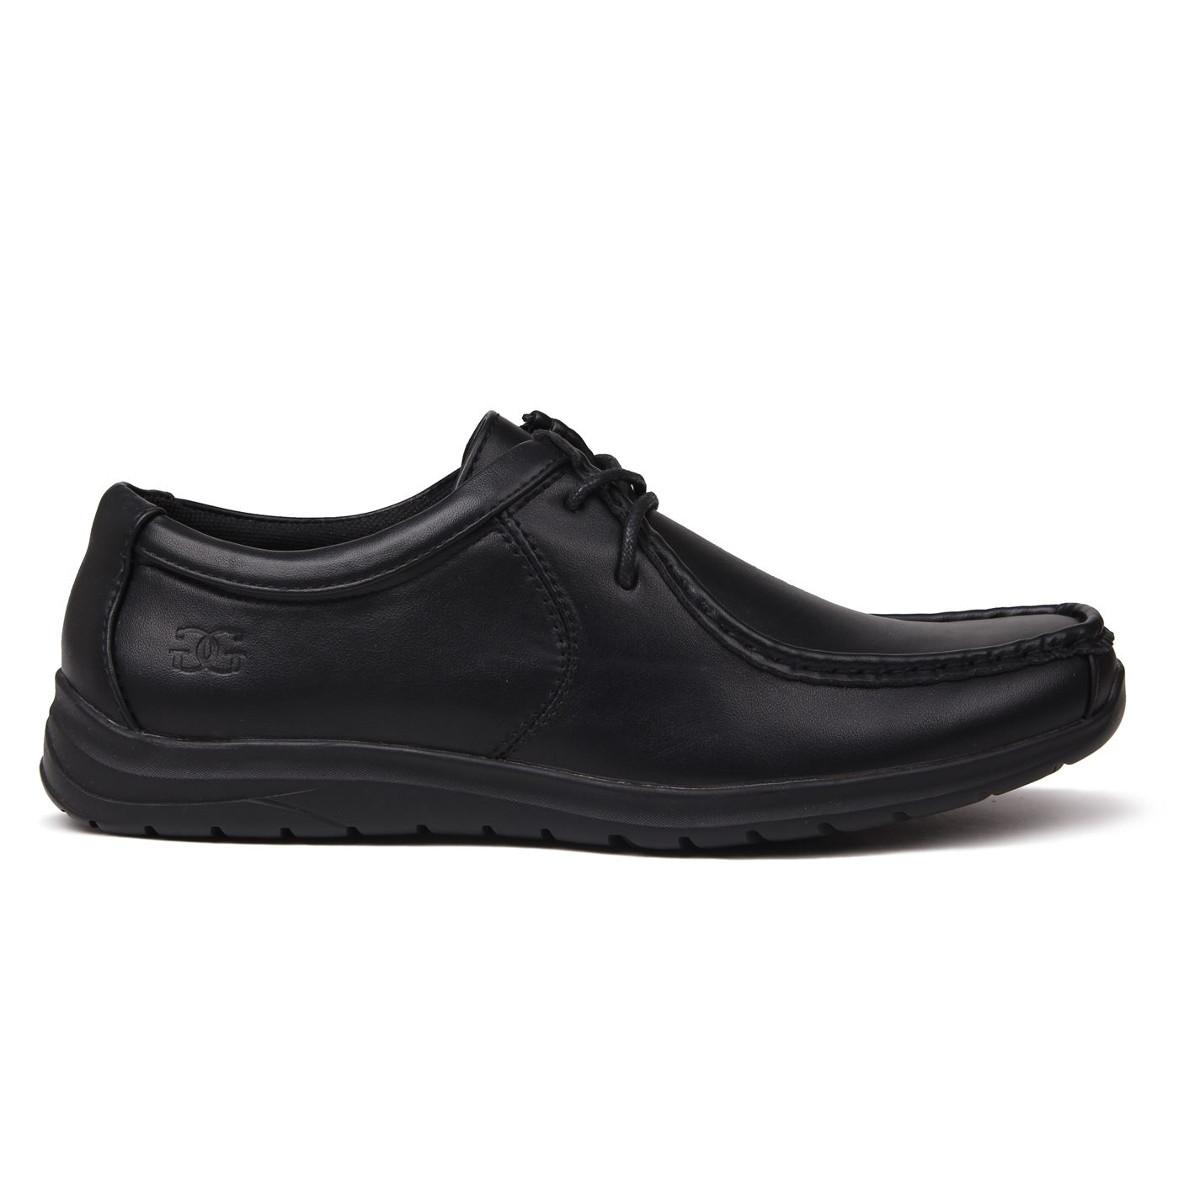 Giorgio Boys' Bexley Lace-Up Casual Shoes - Black, 5